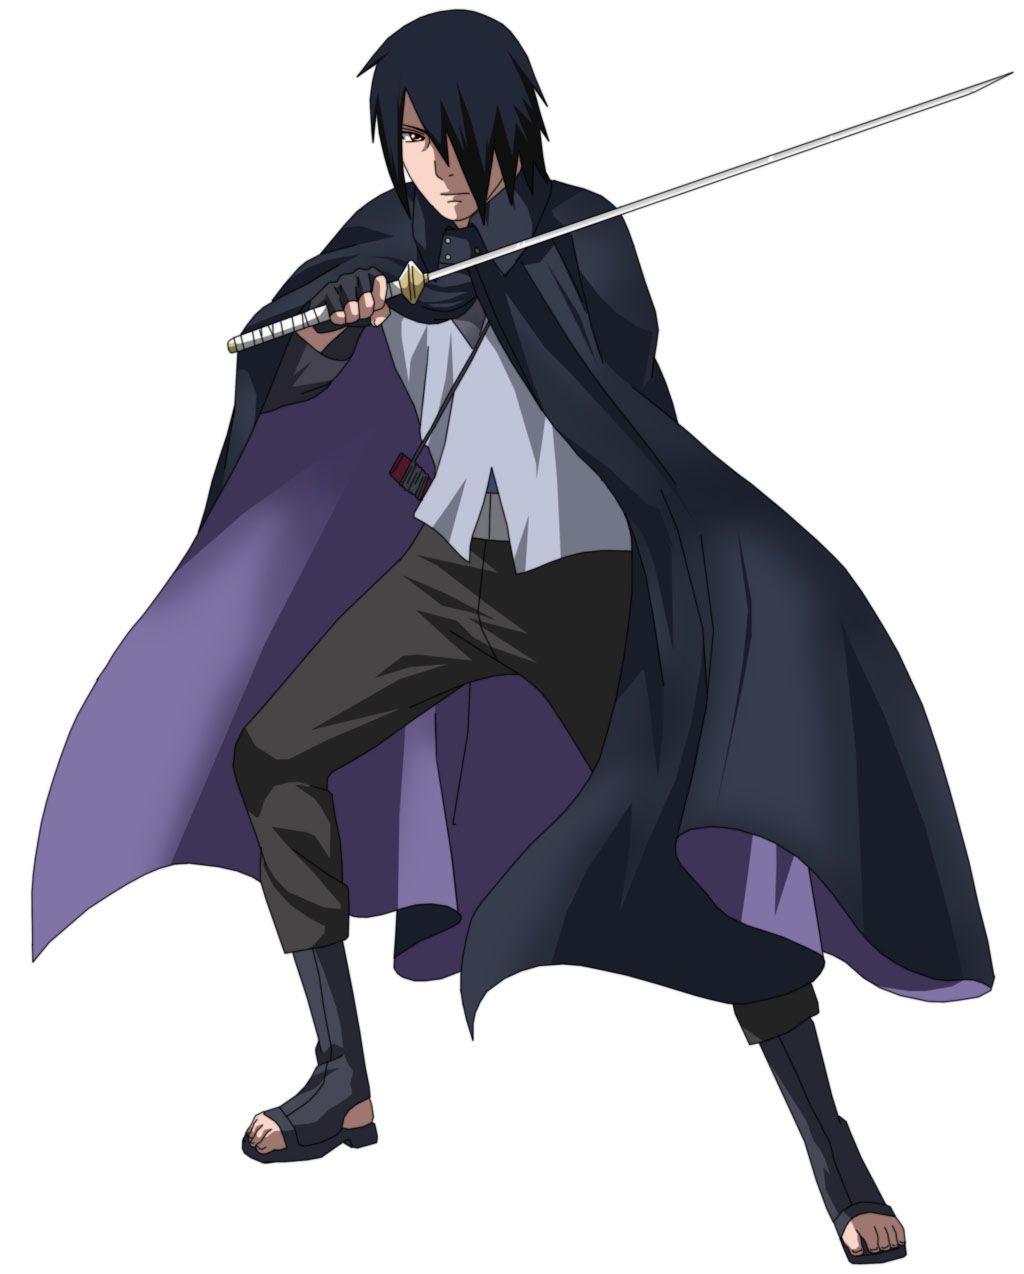 What Is The Name Of Uchiha Sasuke Sword Gambar Karakter Gambar Anime Kartun